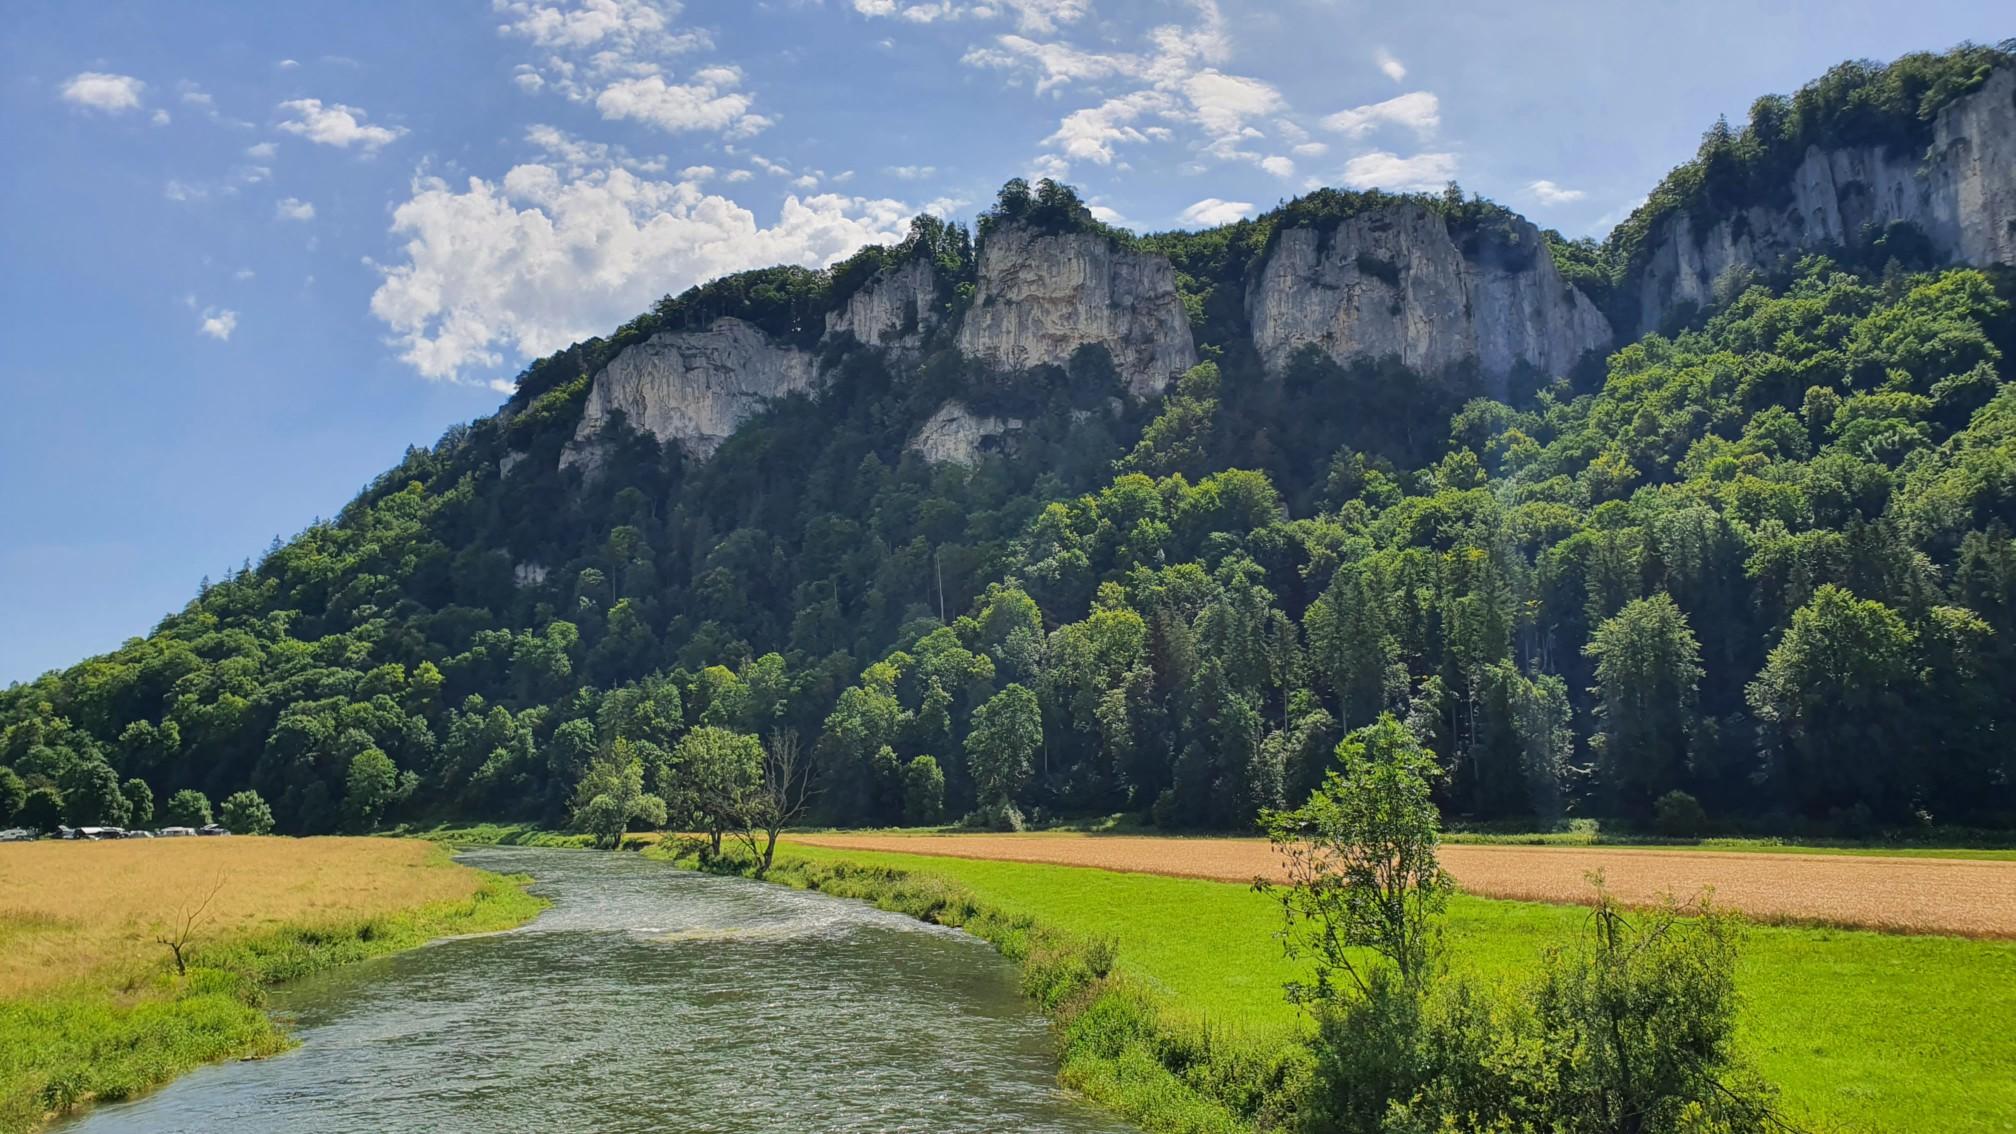 Bei Beuron an der Donau